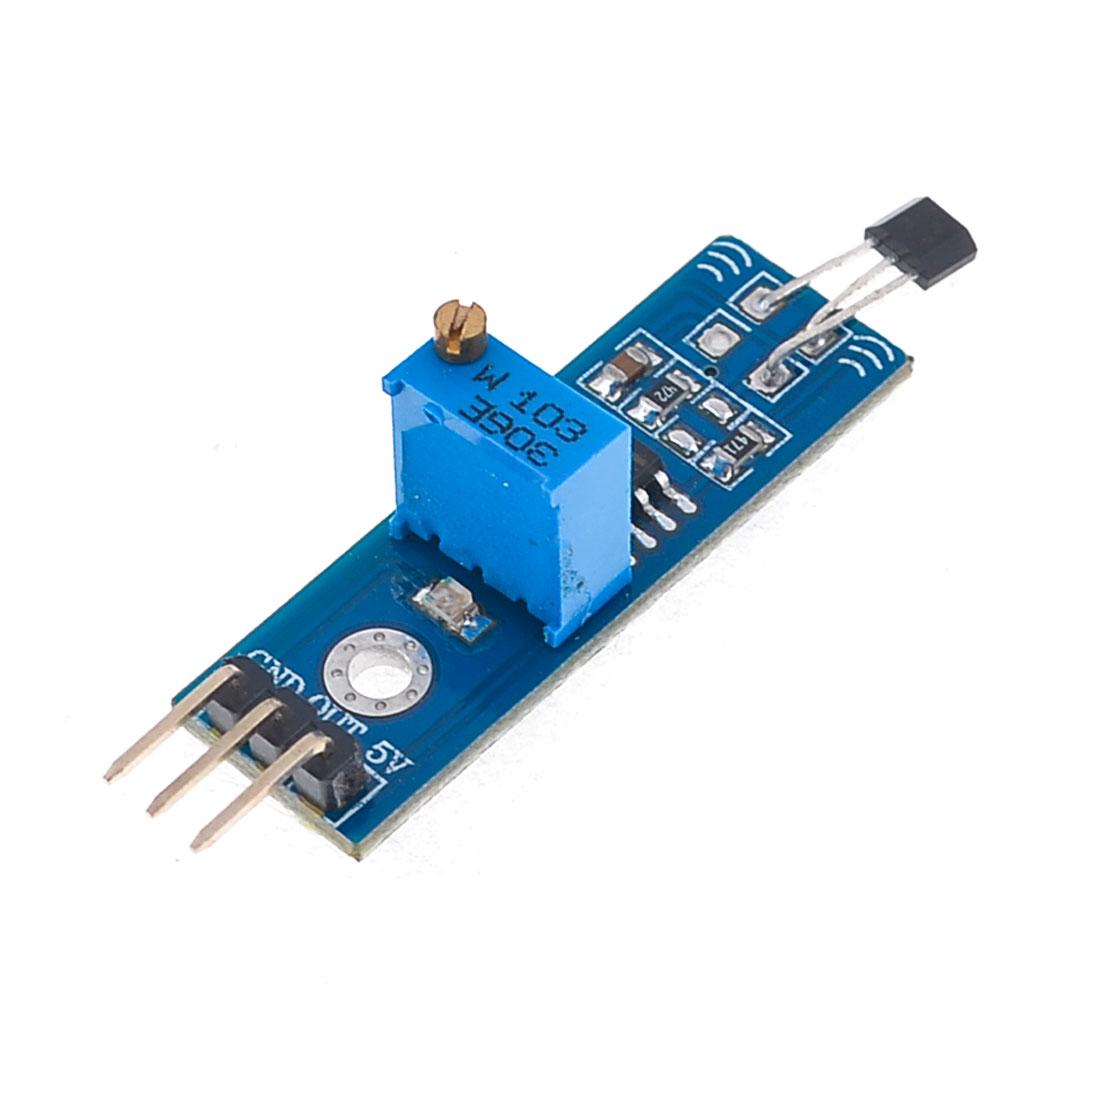 LM393 Chip 3144 3 Terminal Hall Sensor Module DC 5V Blue